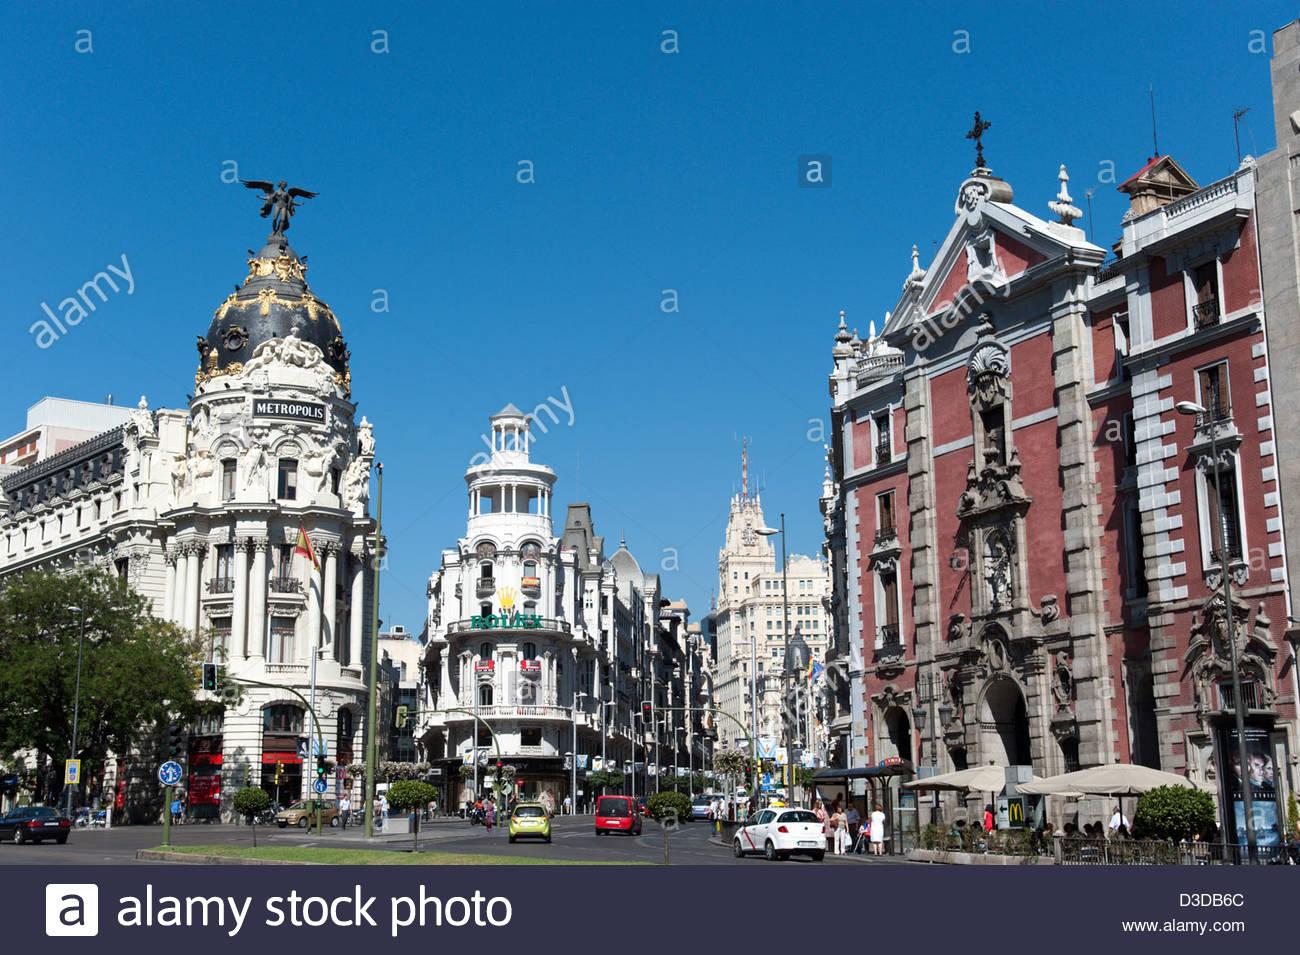 Metropolis building on the corner of Calle de Alcala and Gran Via, Madrid, Spain - Stock Image